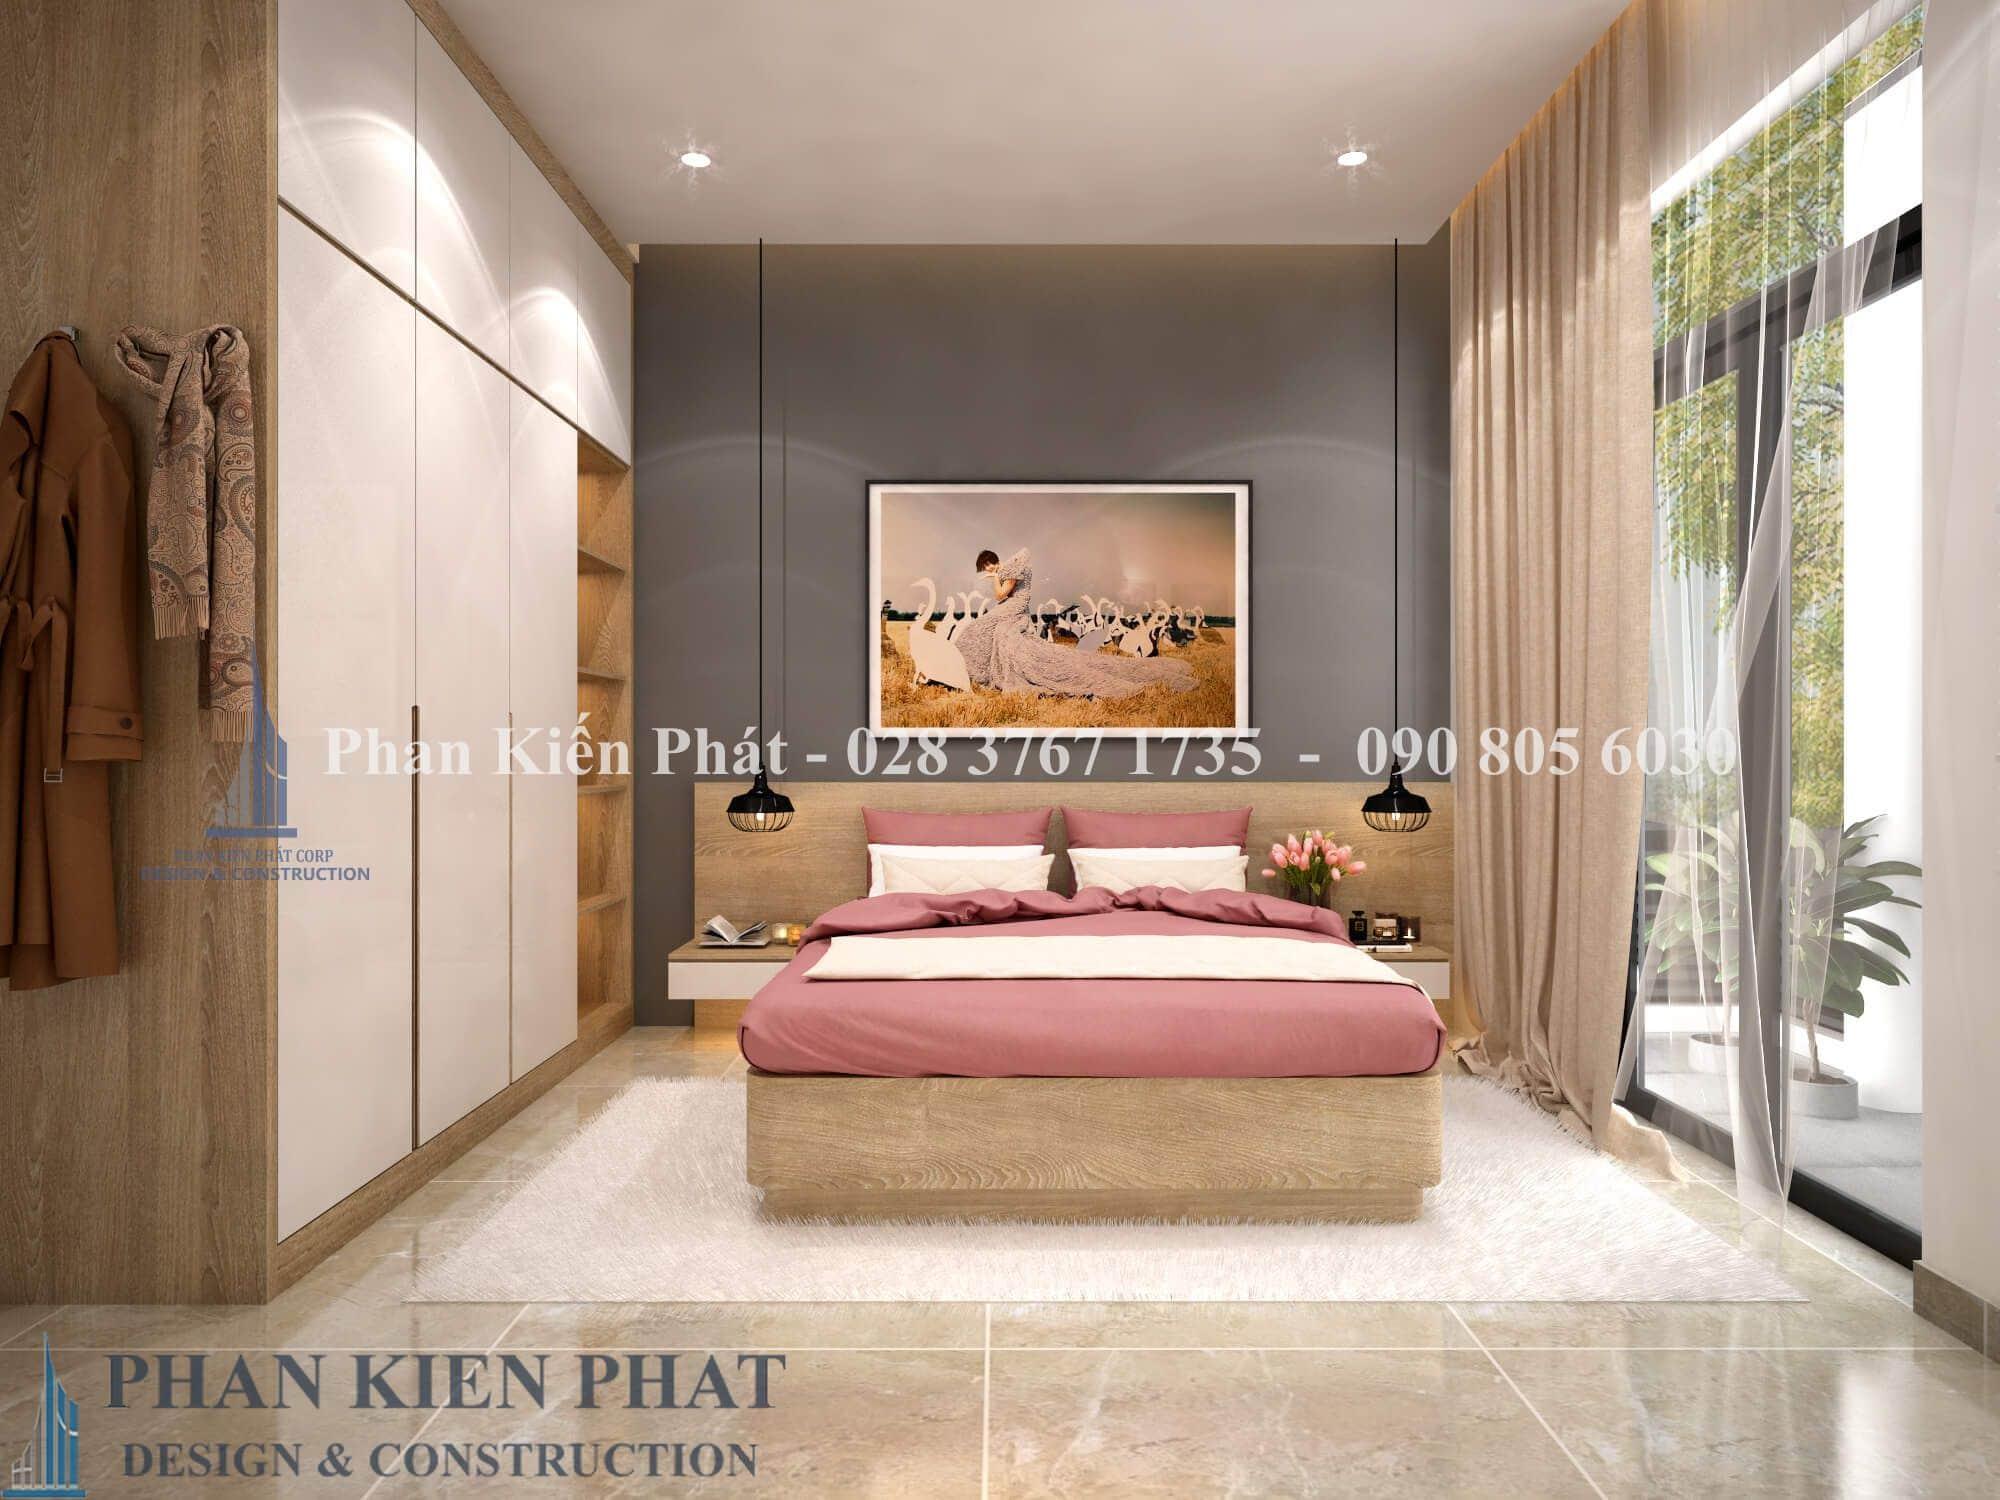 Noi That Phong Ngu Con Gai View 1